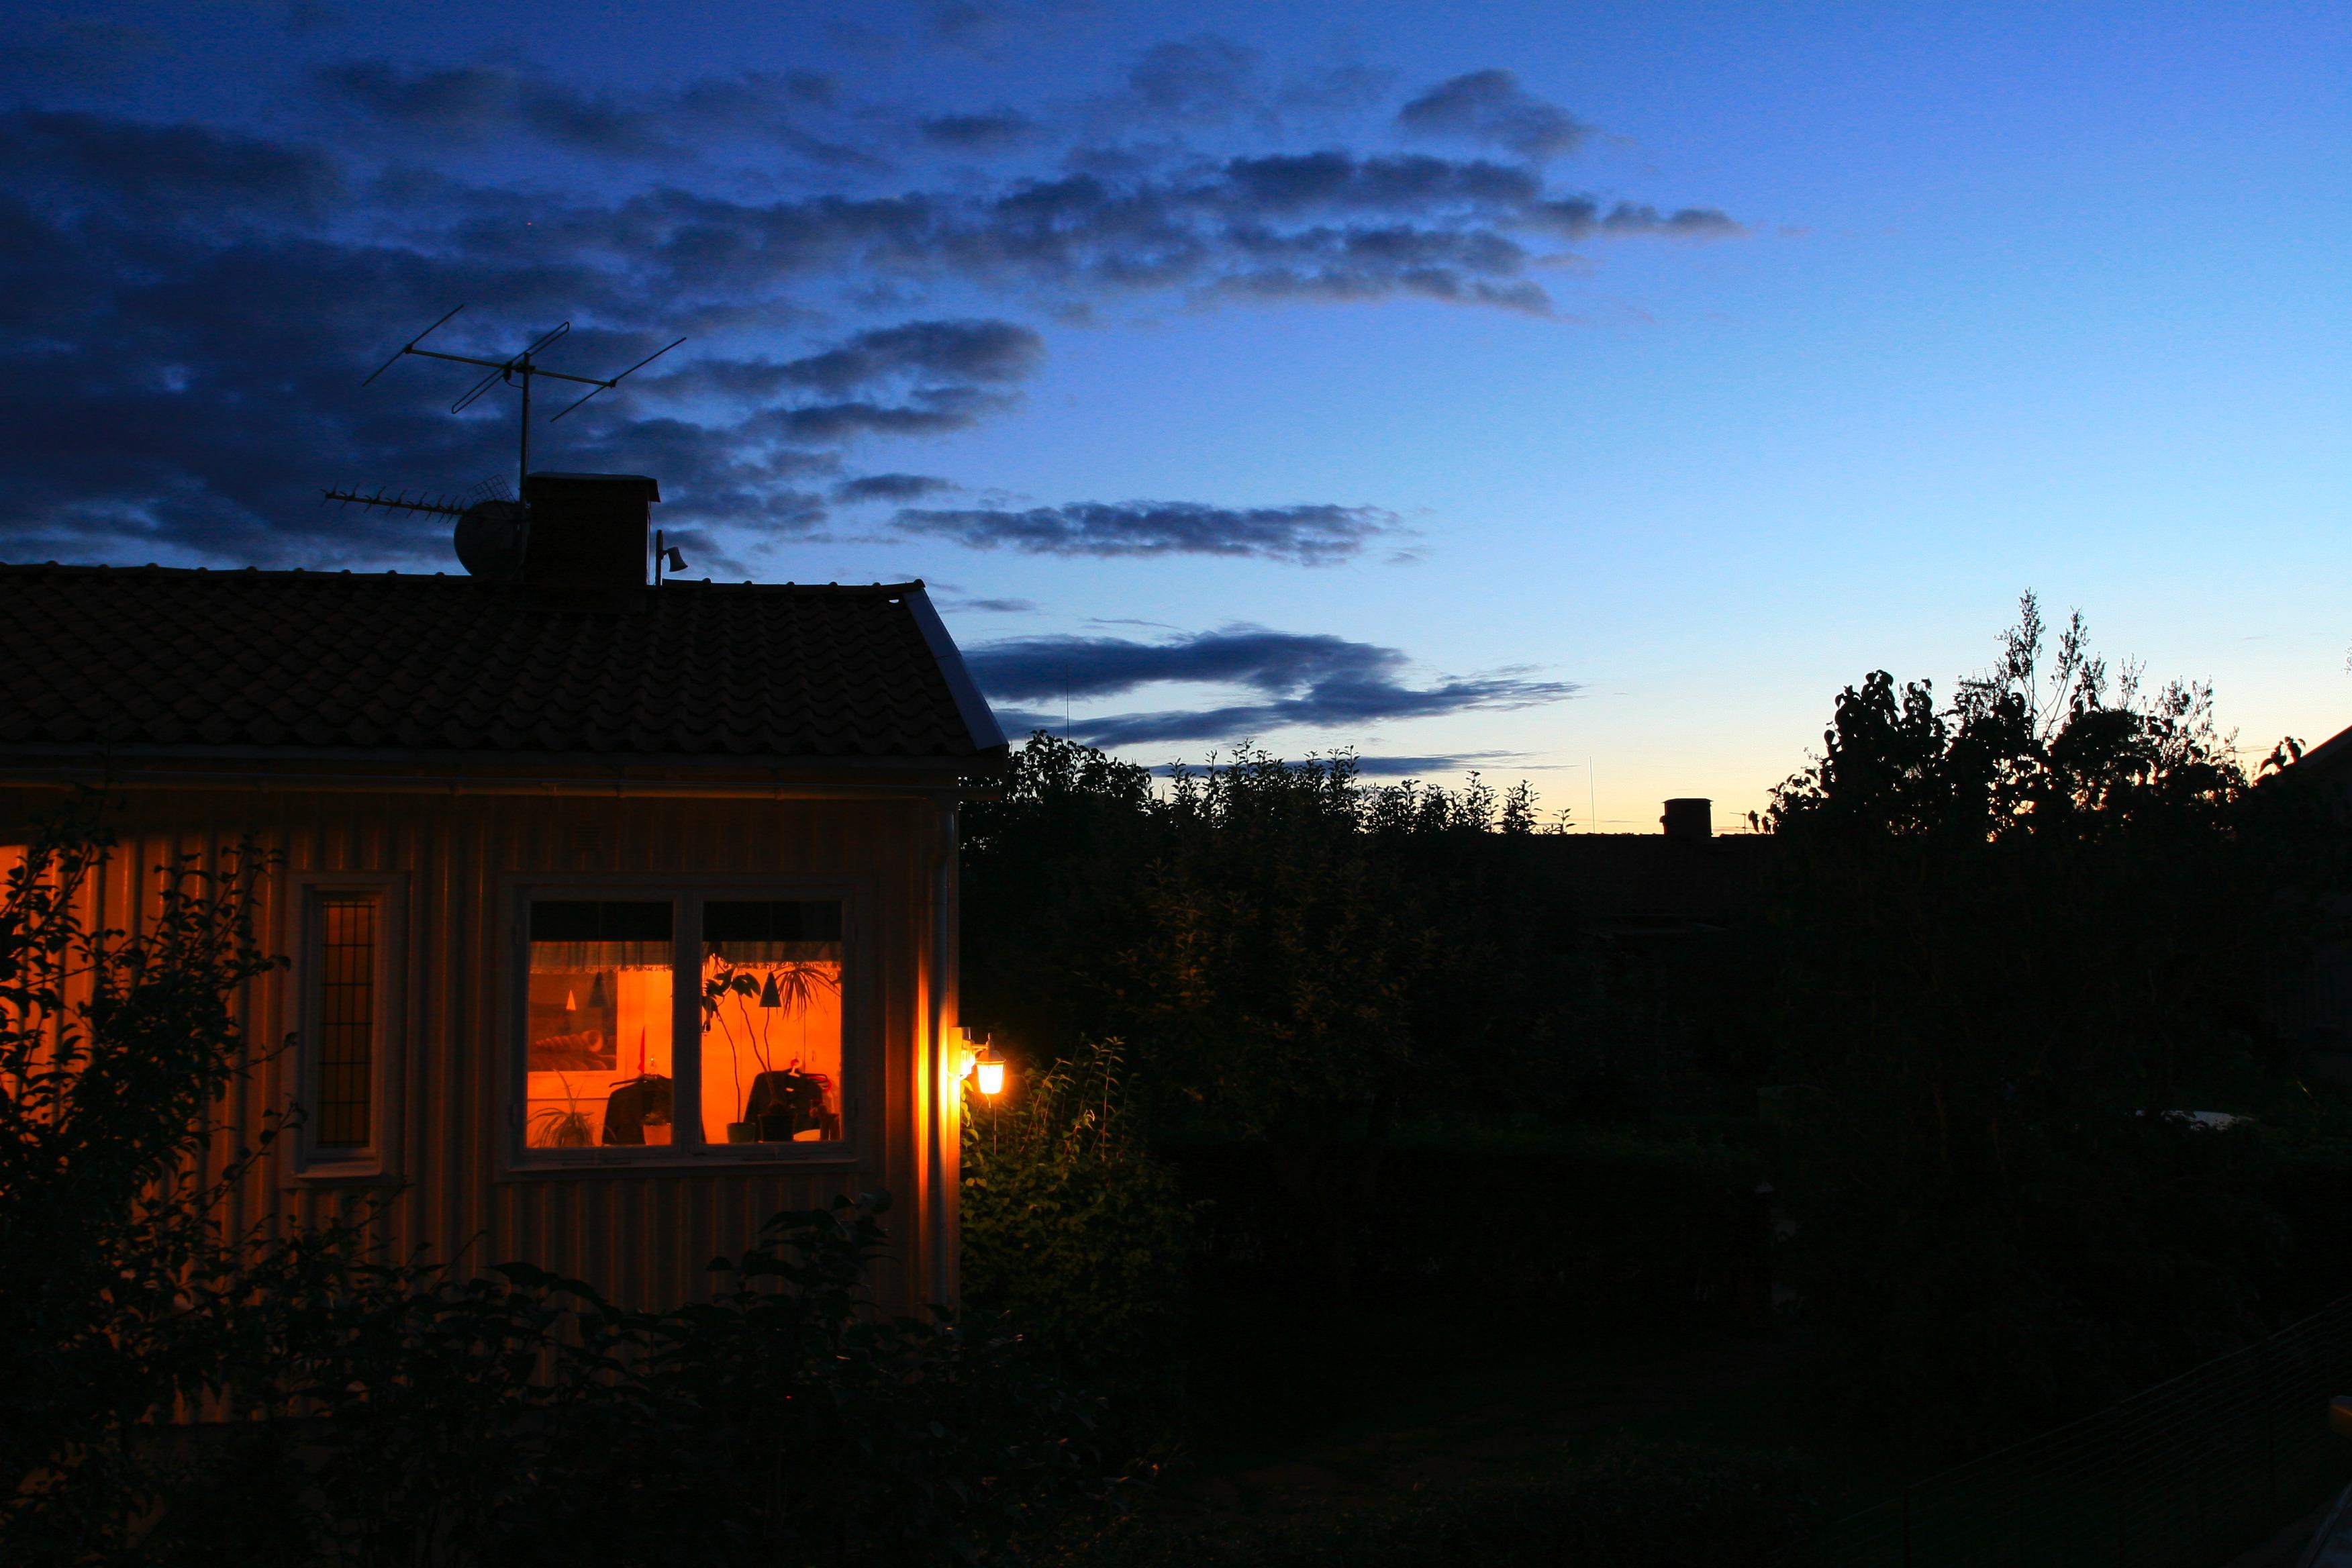 House at Night, Night, Sky, Sunset, Warm, HQ Photo